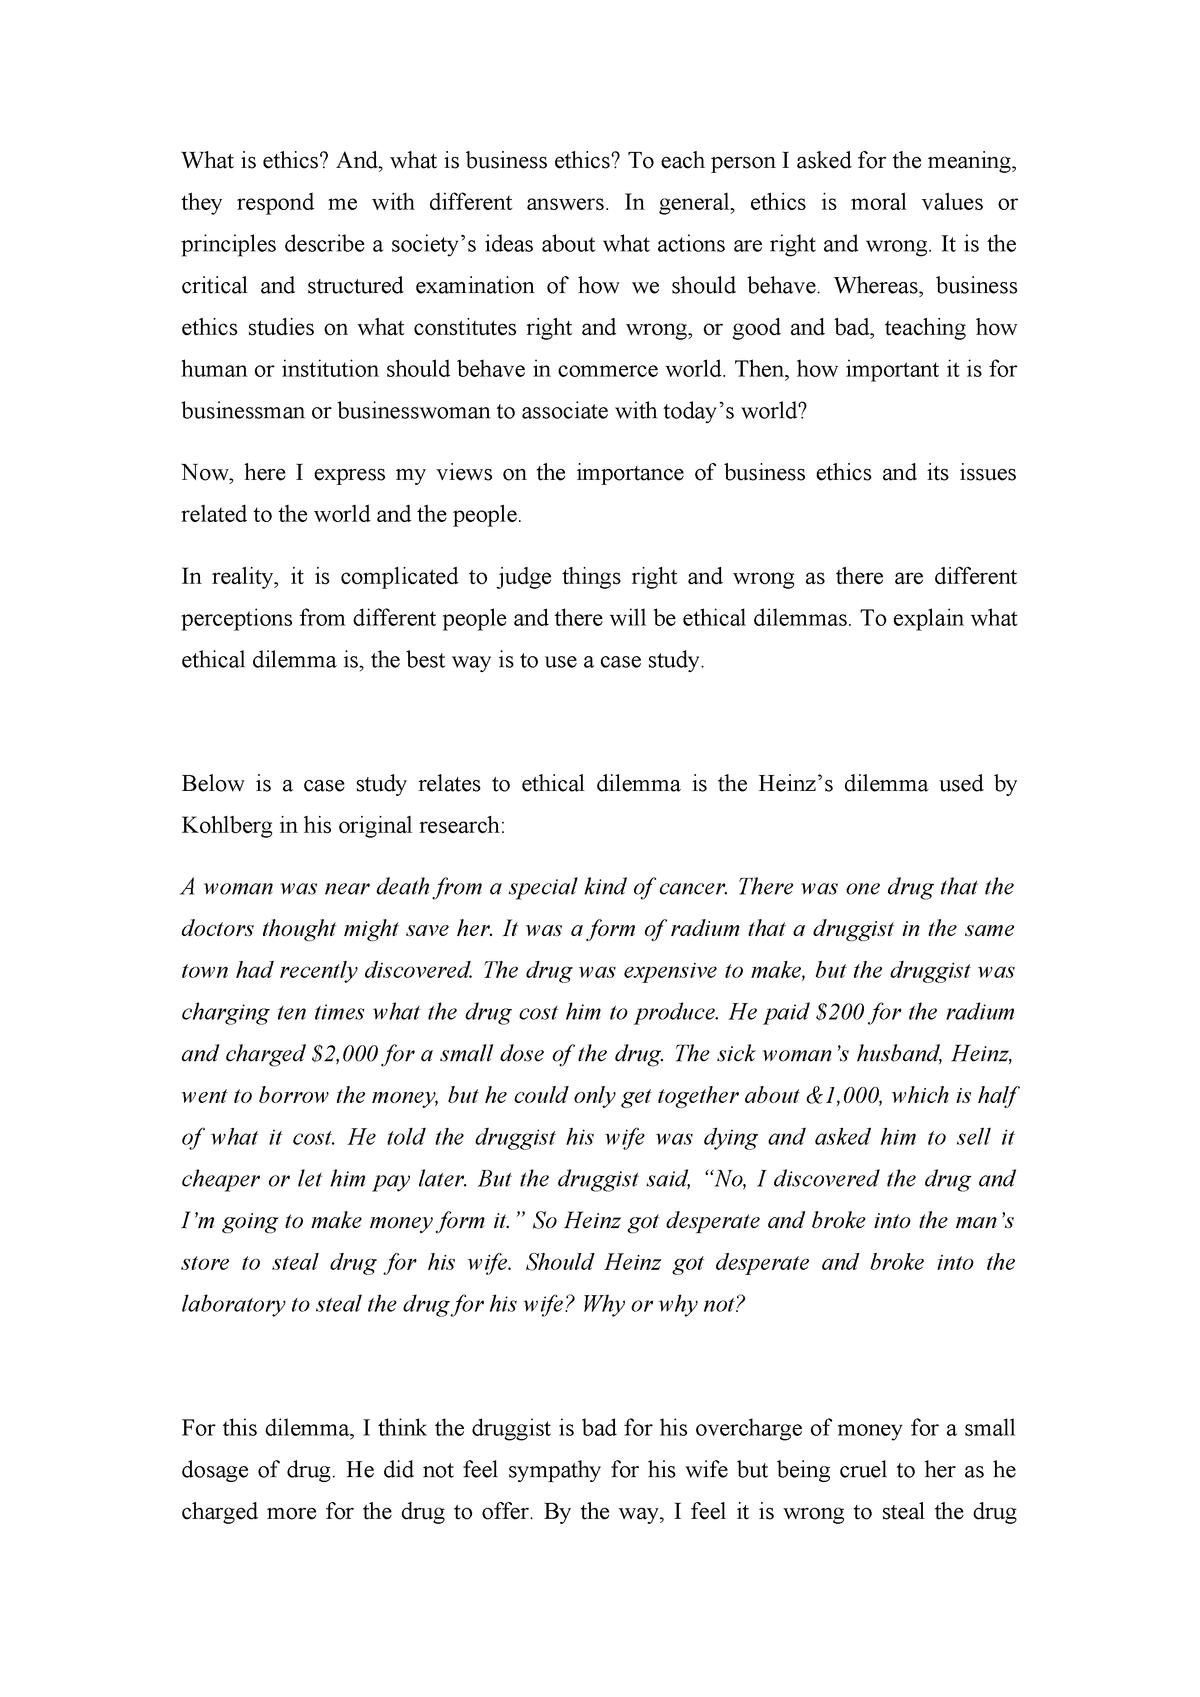 Reflective Essay - COMM101: Principles of Responsible Commerce - StuDocu